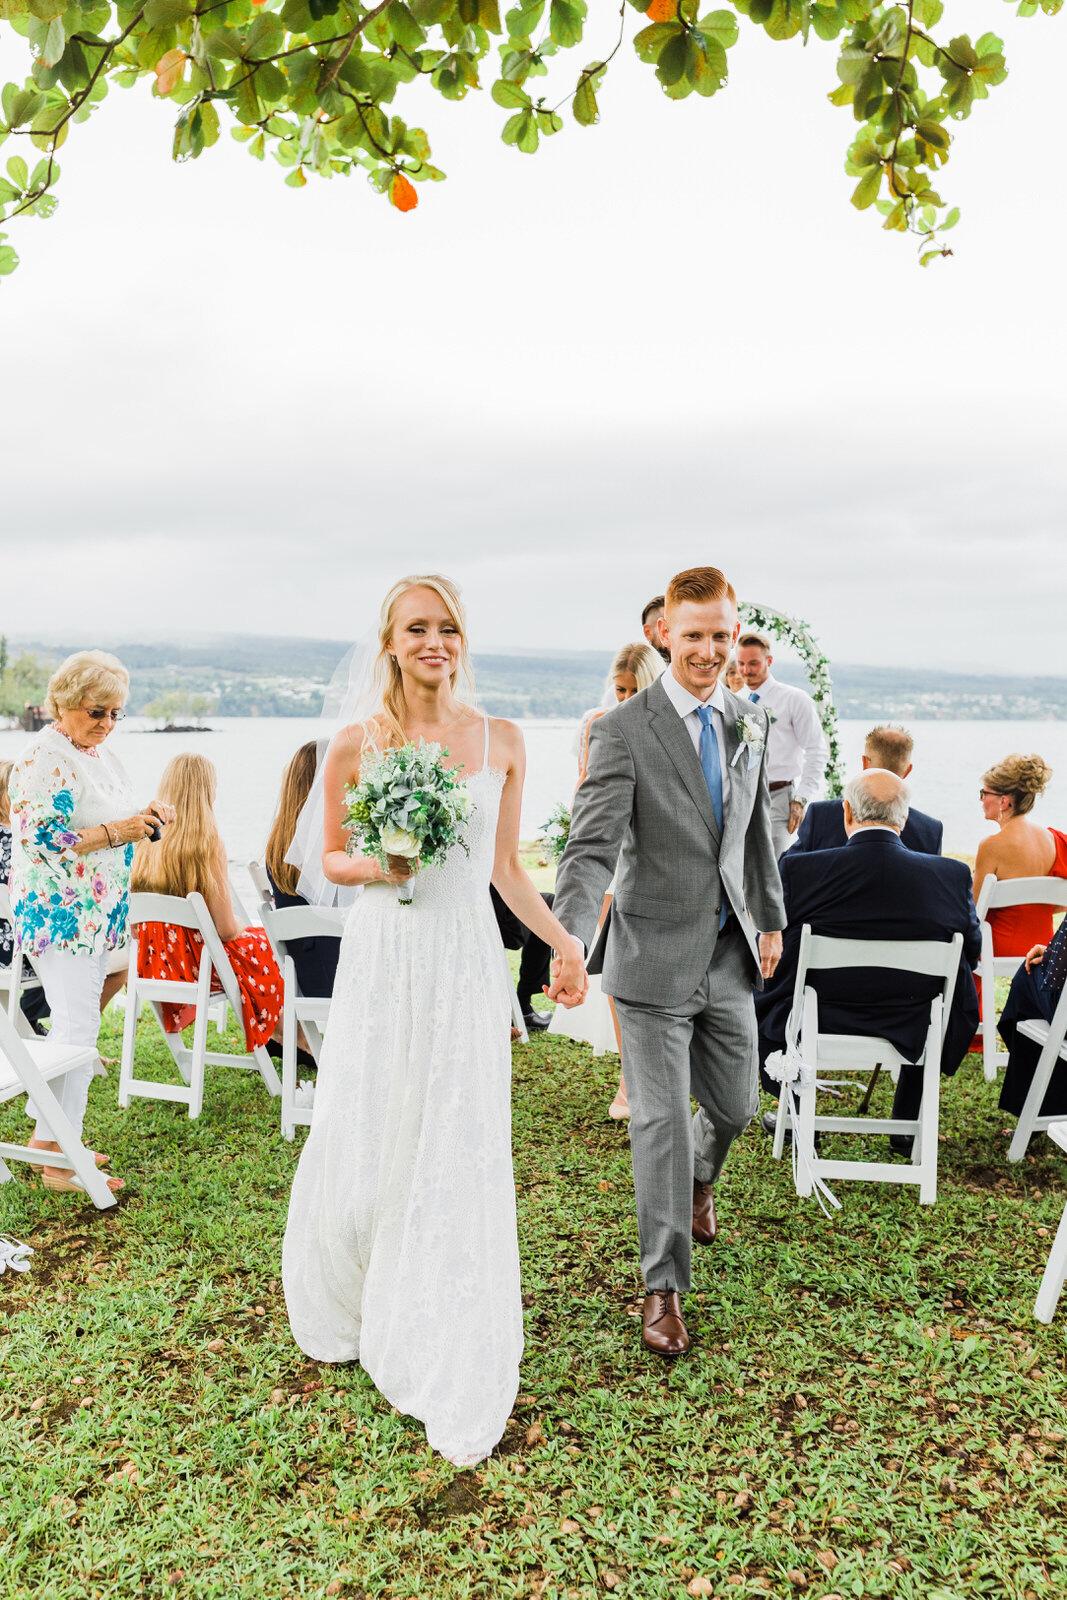 small-wedding-hawaii-destination-hilton-coconut-island-9810-1.jpg